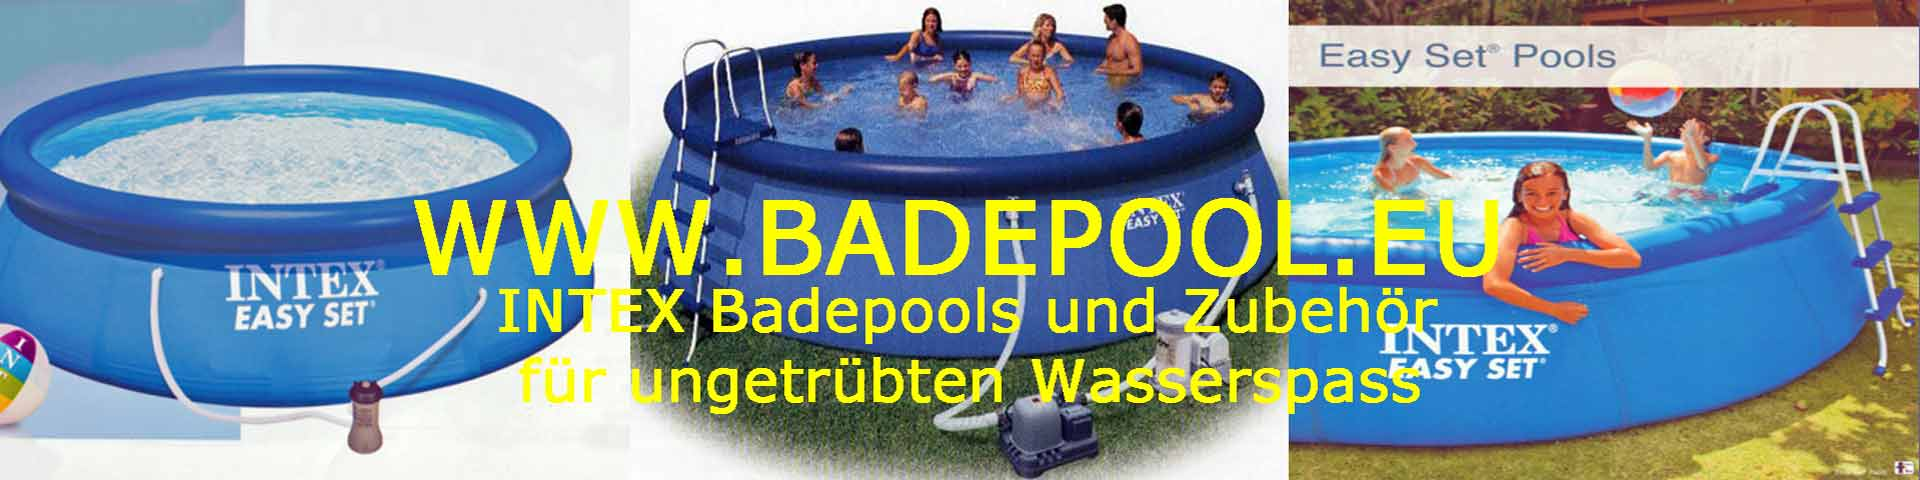 Intex badepool oberfl chenskimmer for Intex pool aktion